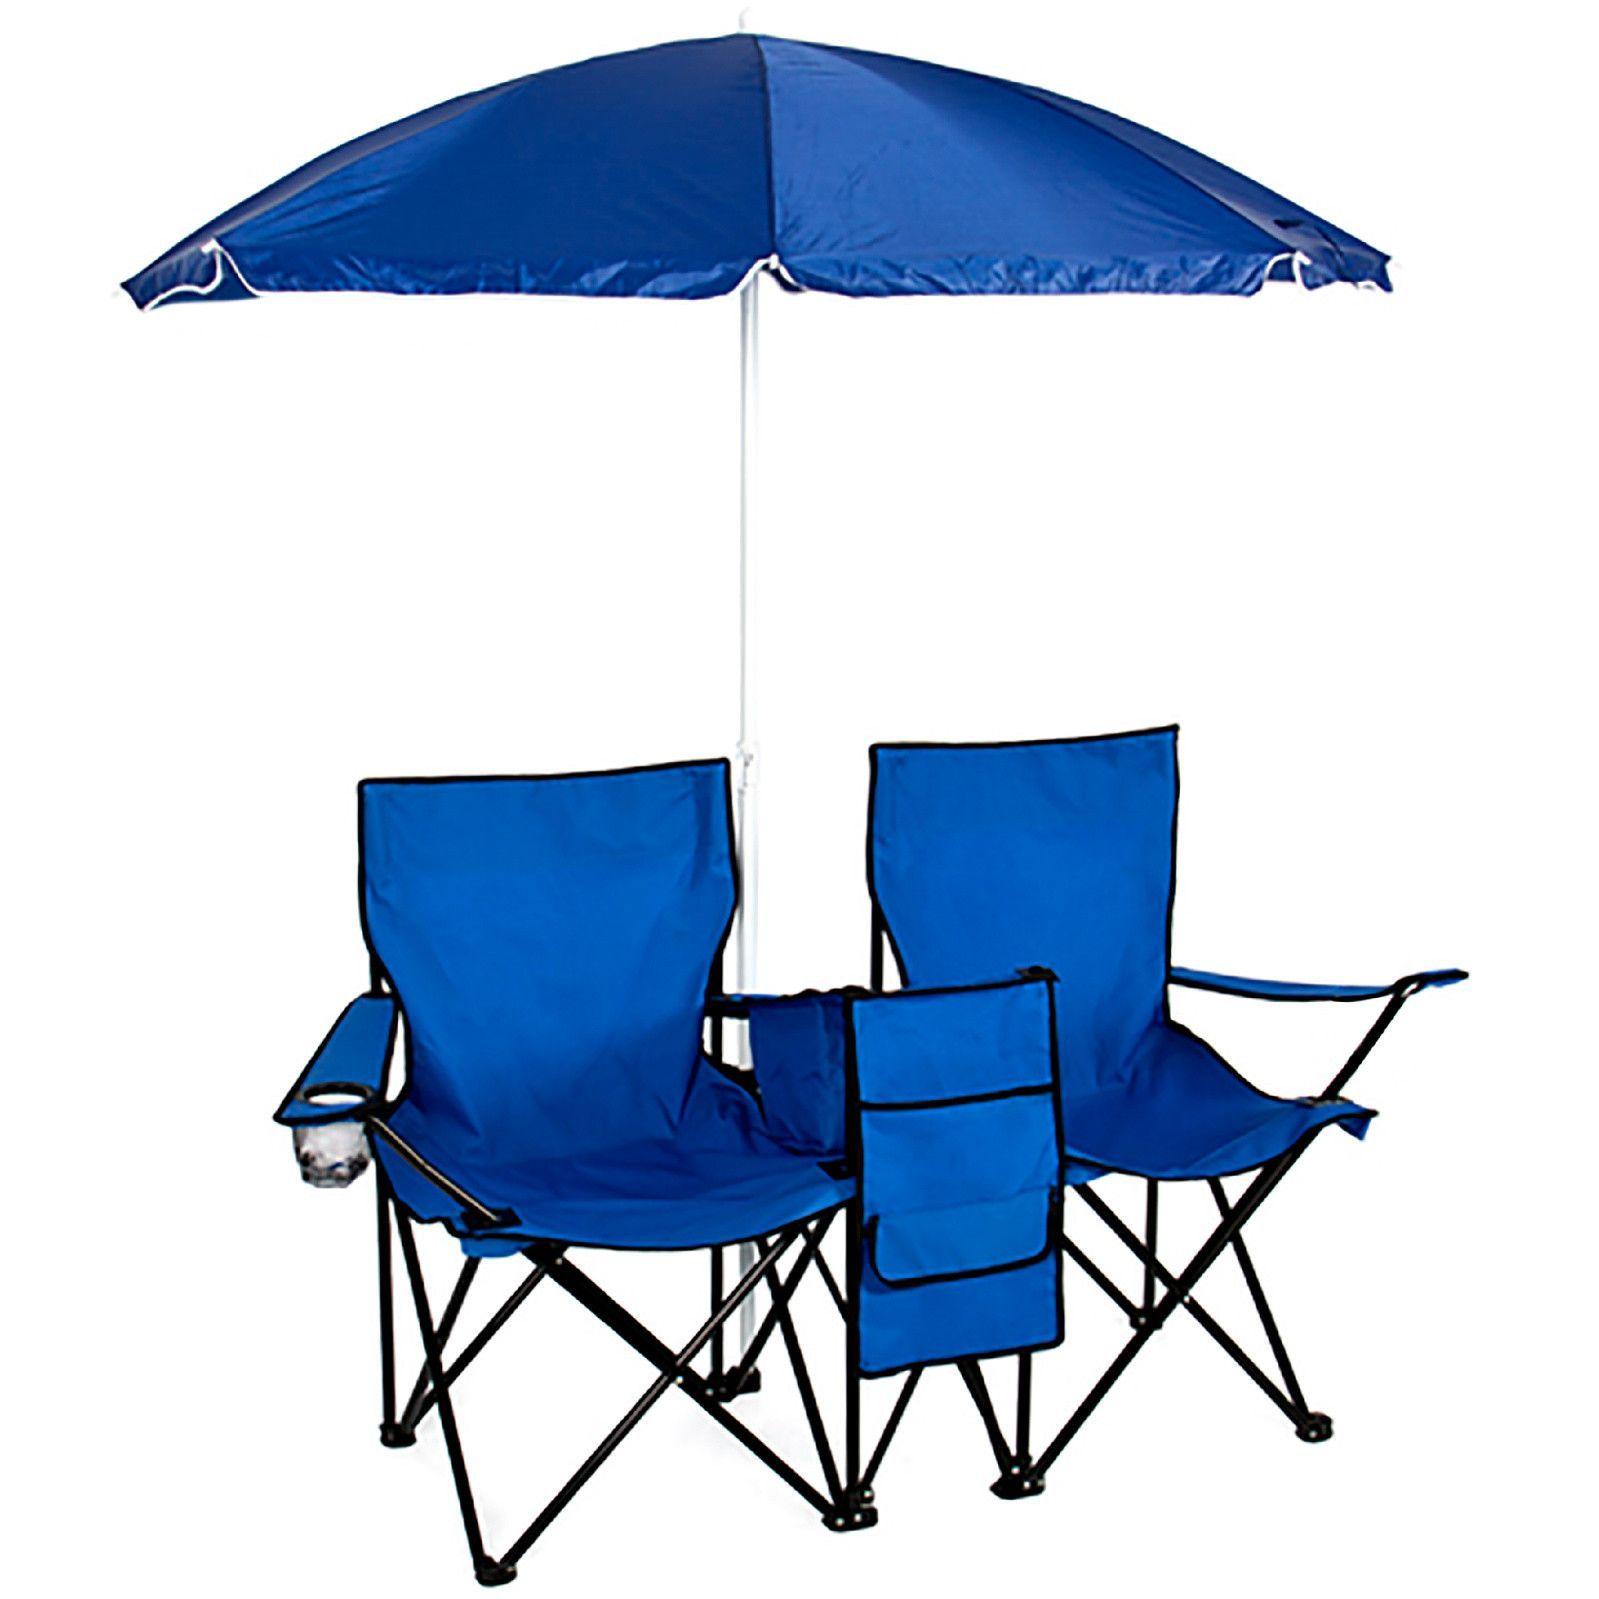 Double folding beach chair w umbrella angela beach ideas